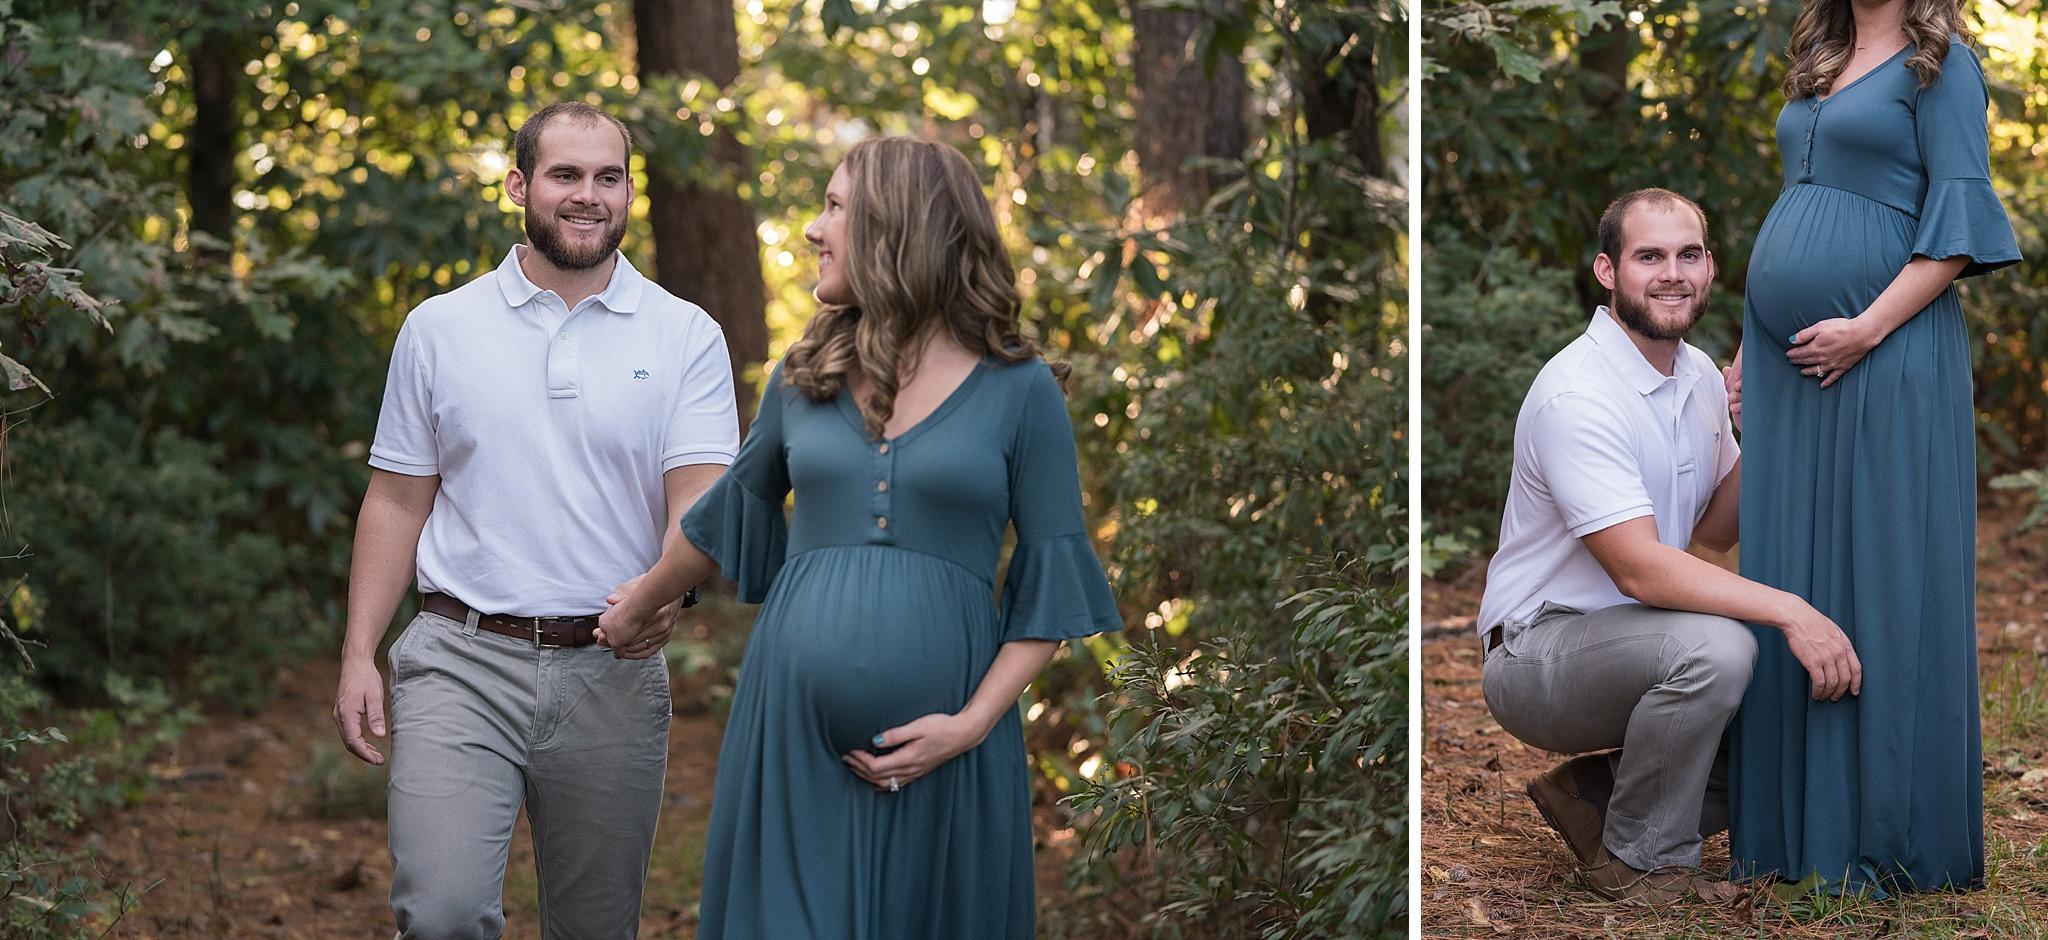 Farmville-NC-Maternity-Photographer-061.jpg